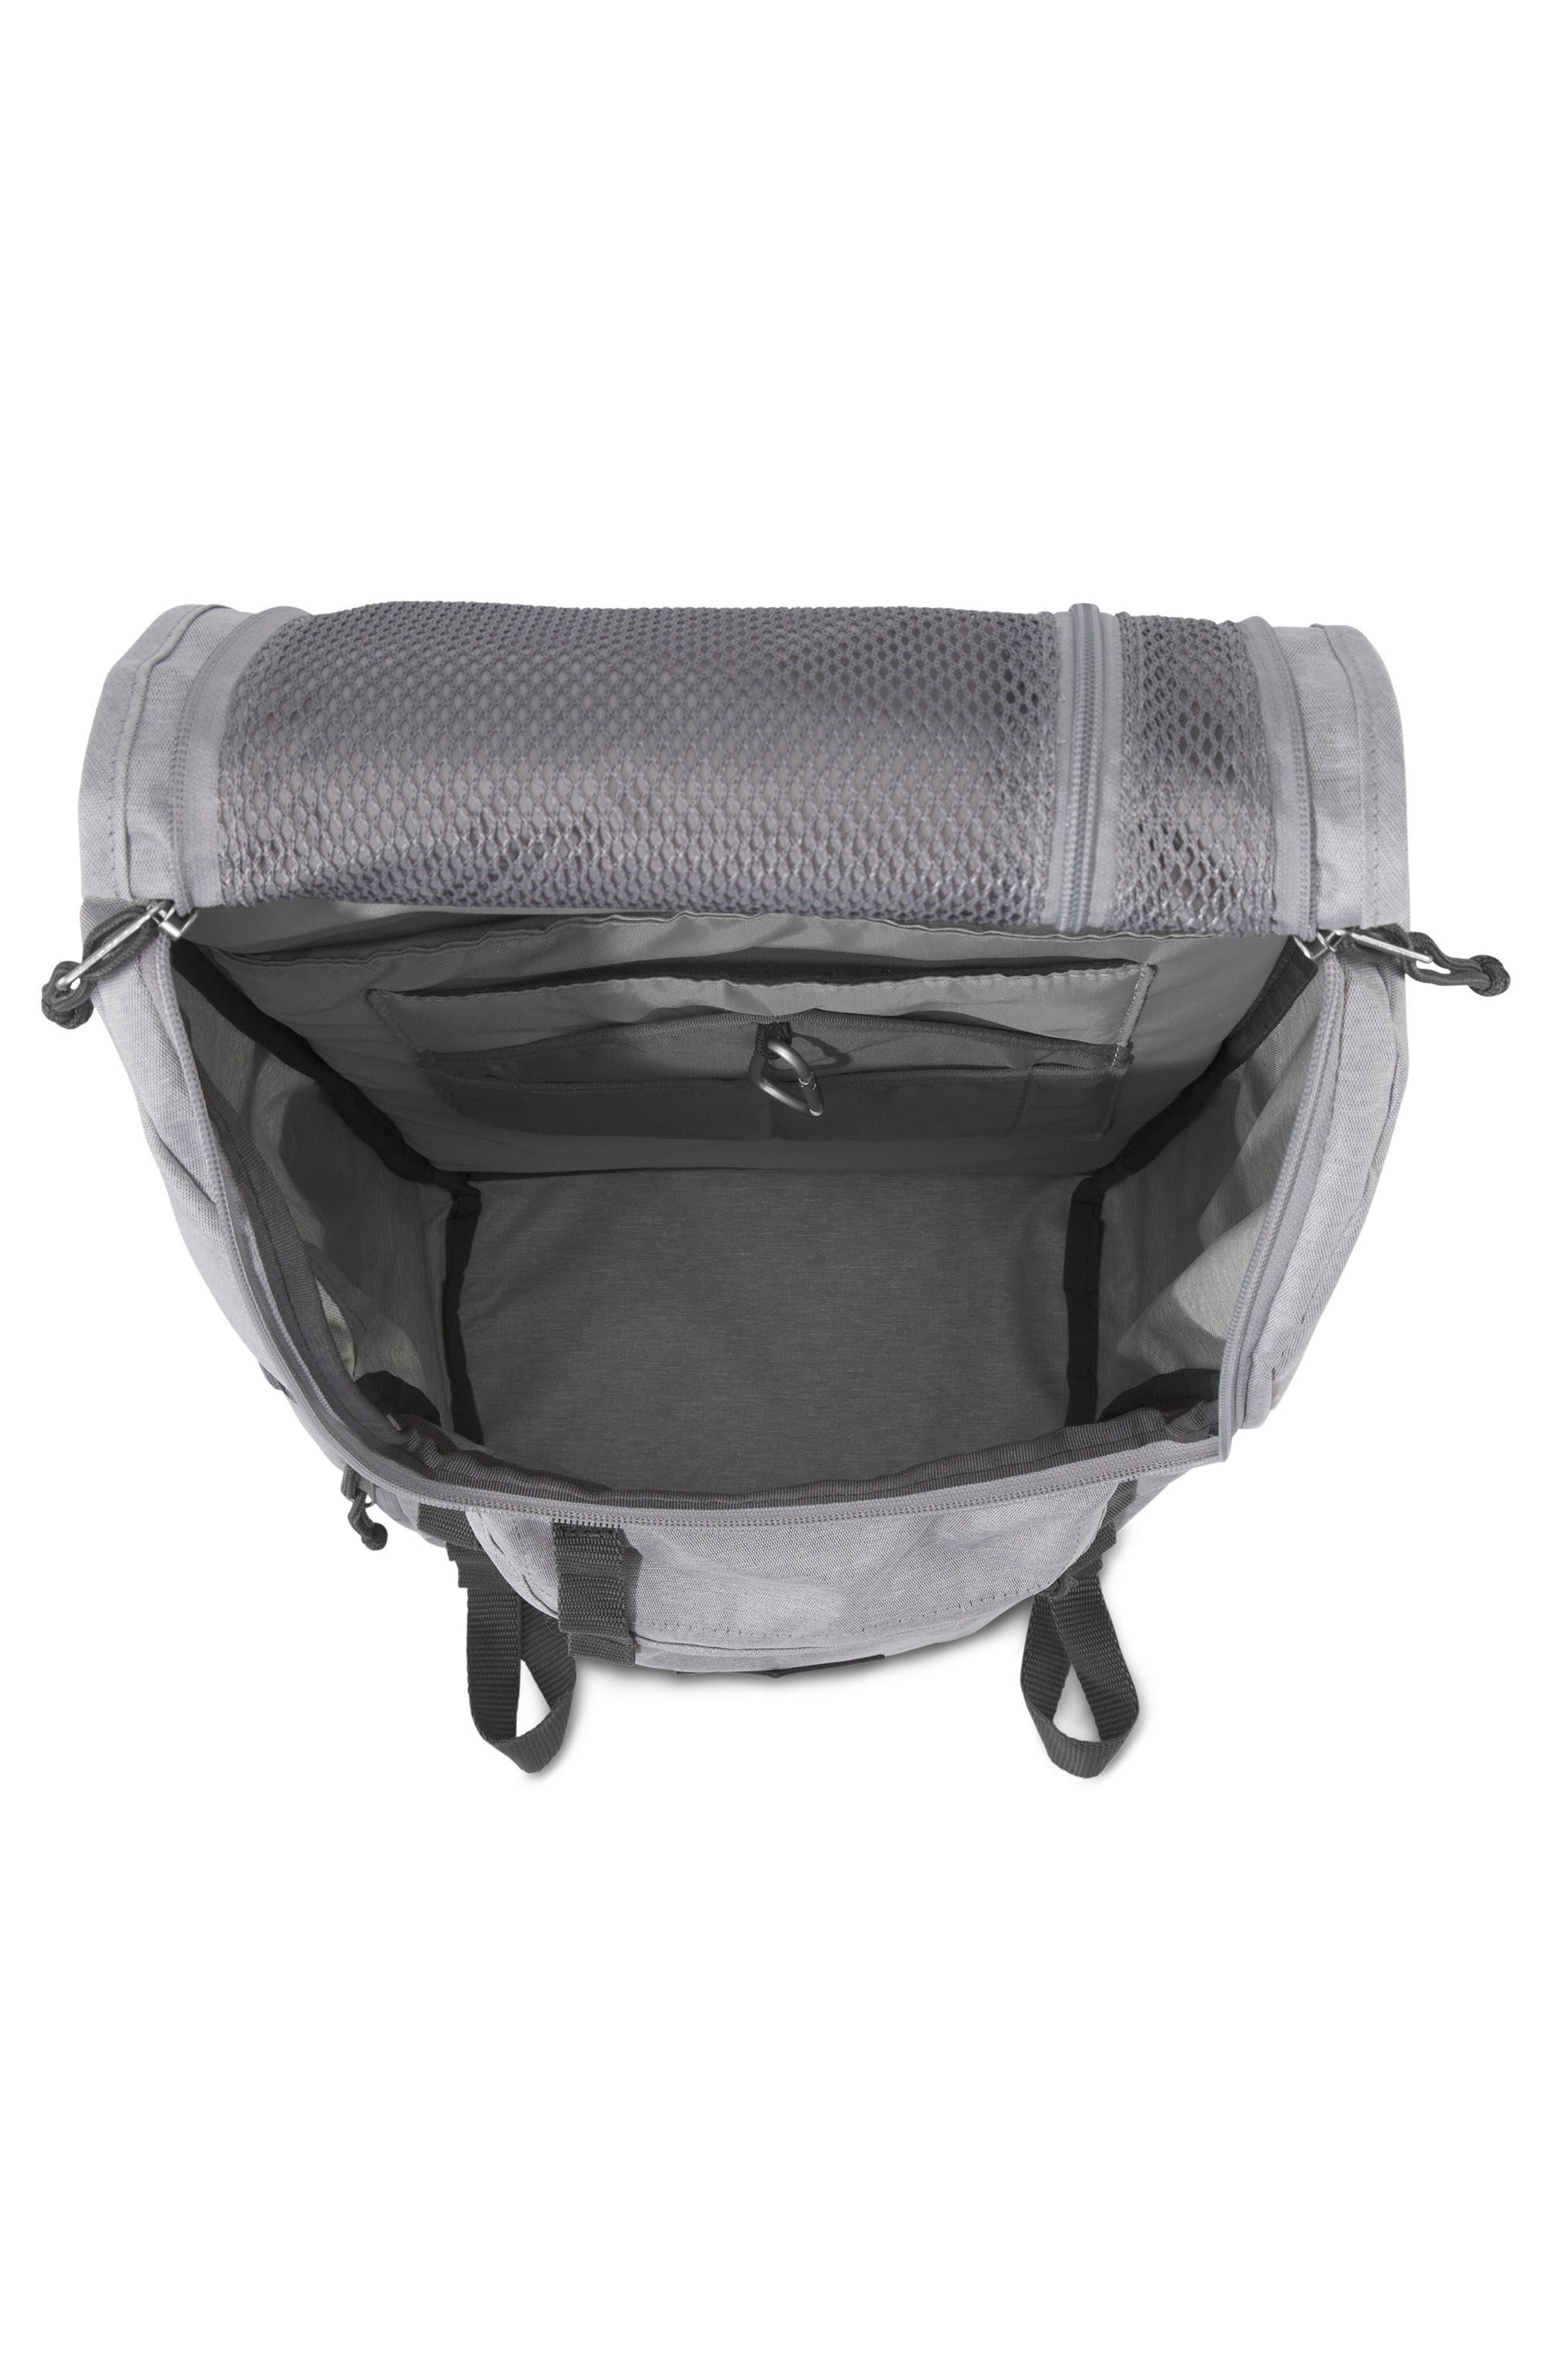 Hatchet Backpack,                             Alternate thumbnail 4, color,                             090